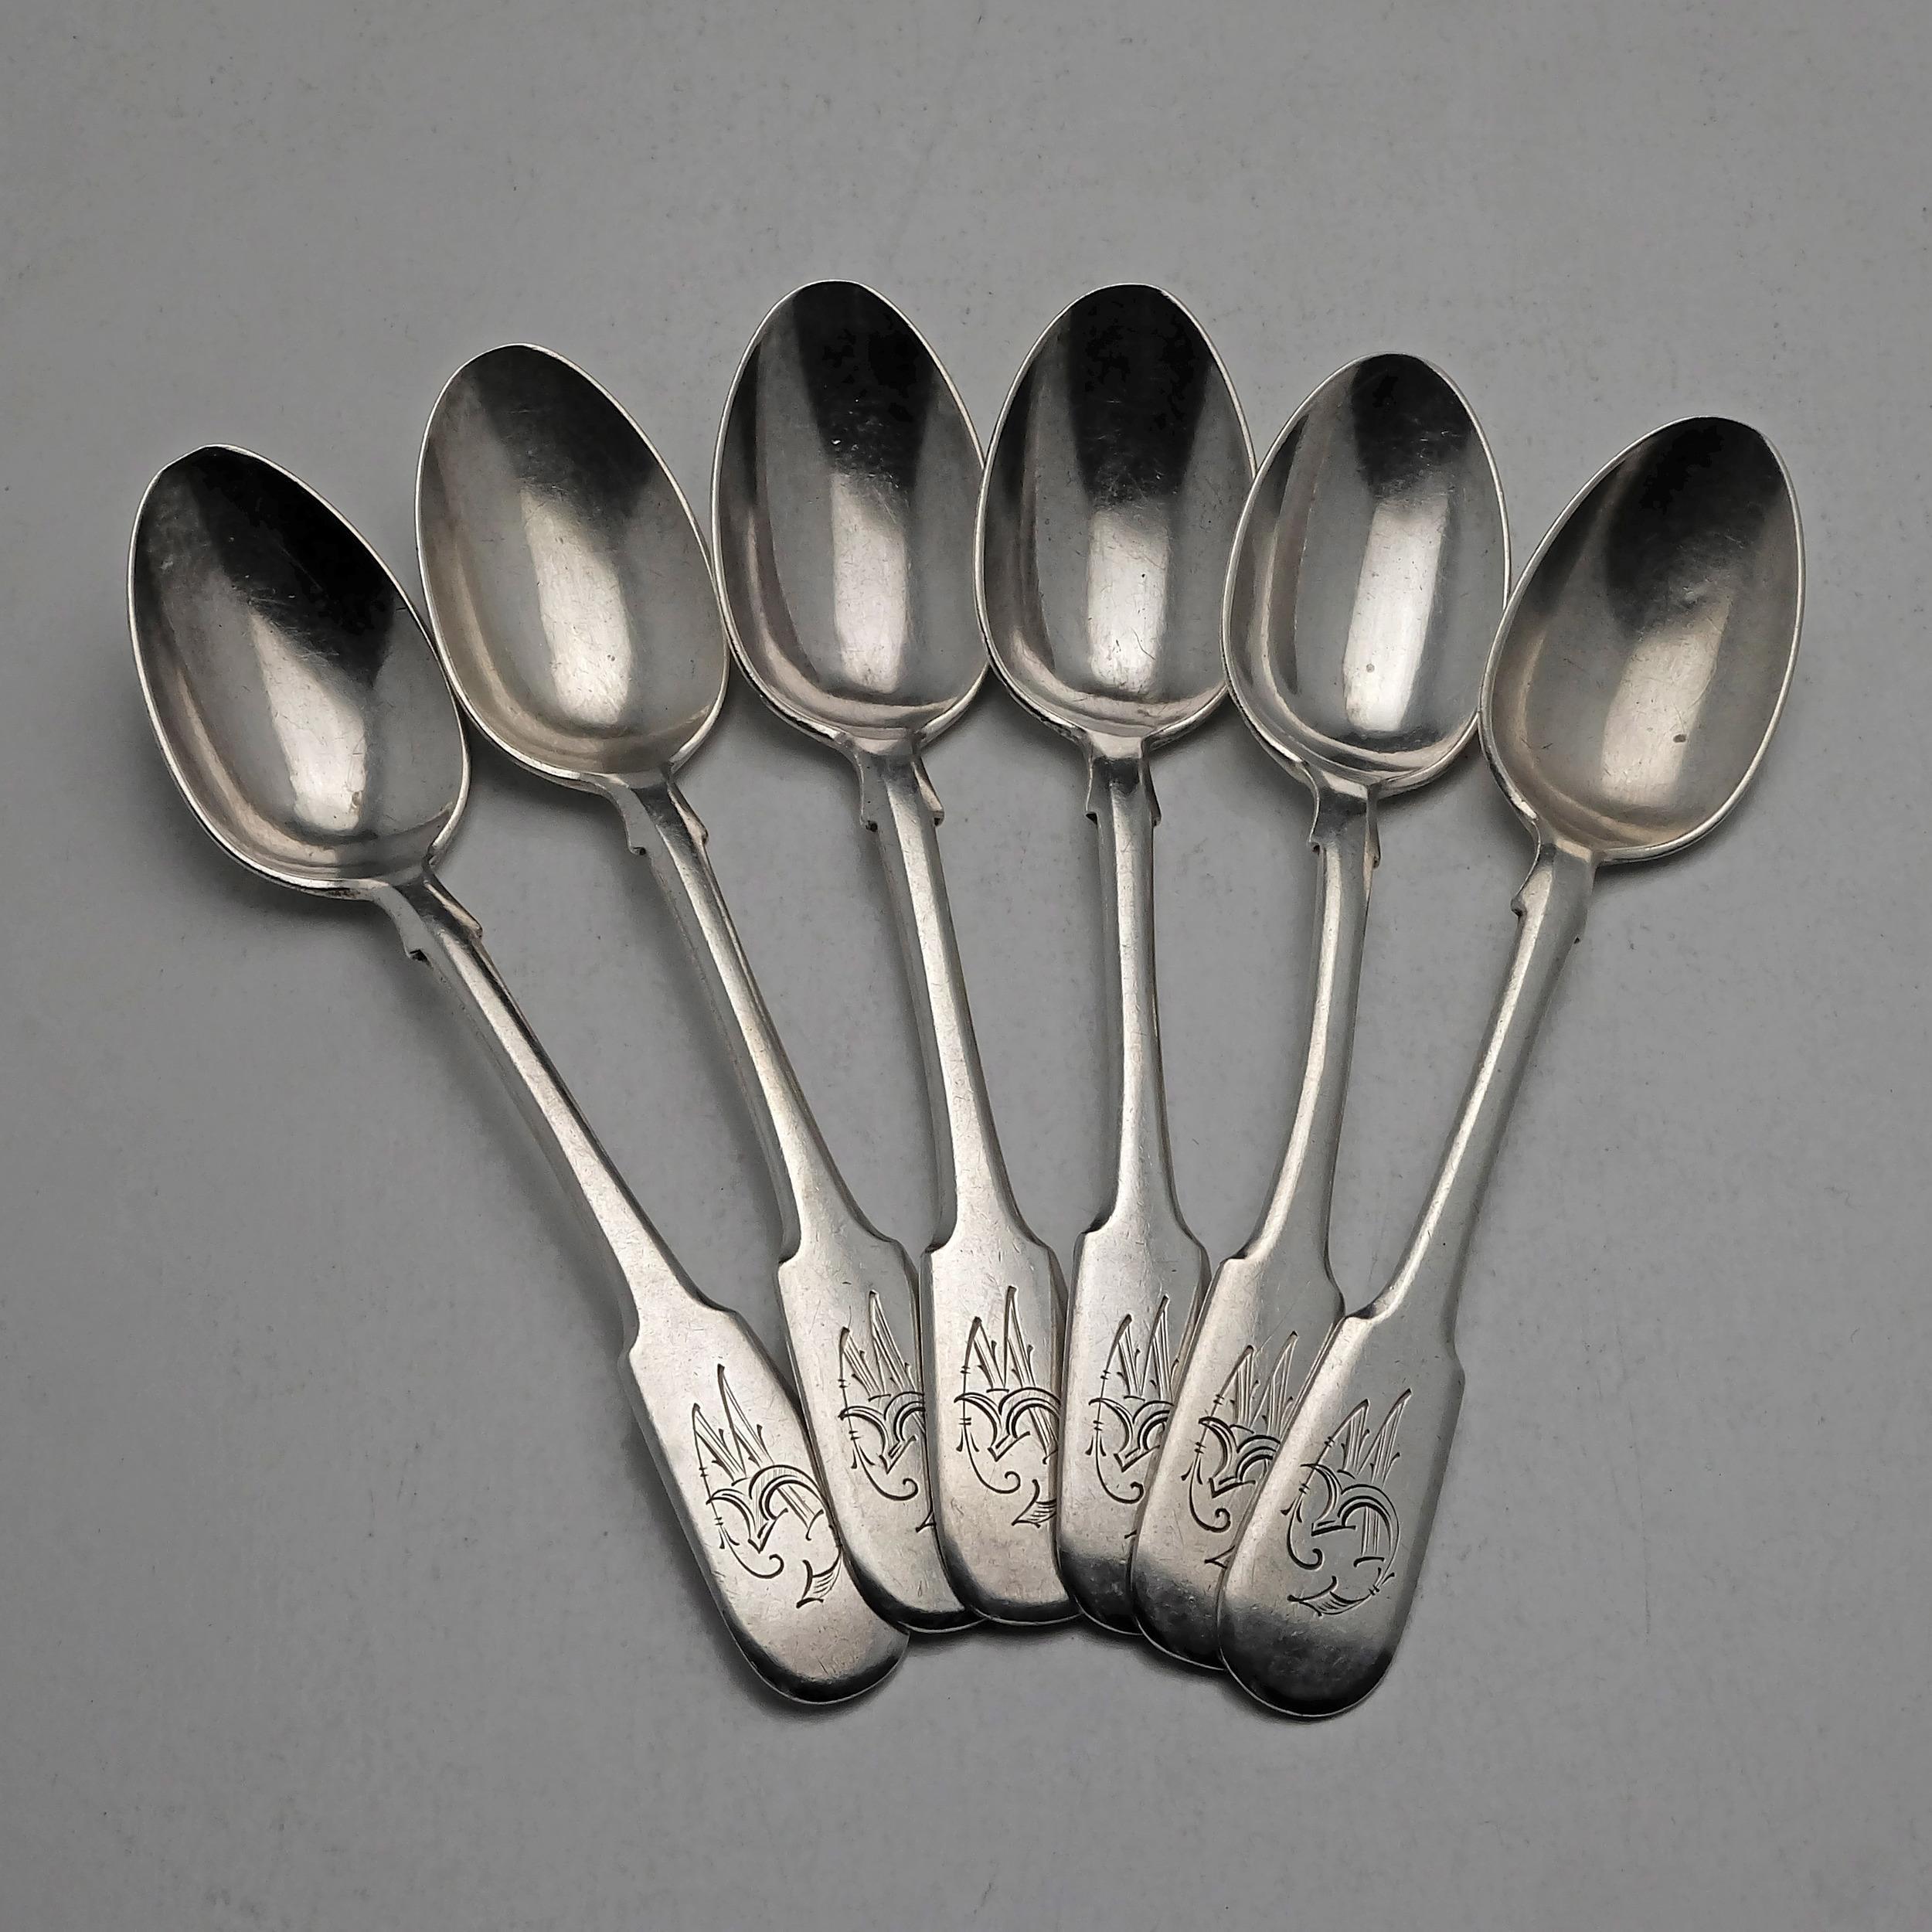 'Set of Six Russian 875 Silver Teapsoons, Pavel Fedorovich Sazikov, St Petersburg 1864'